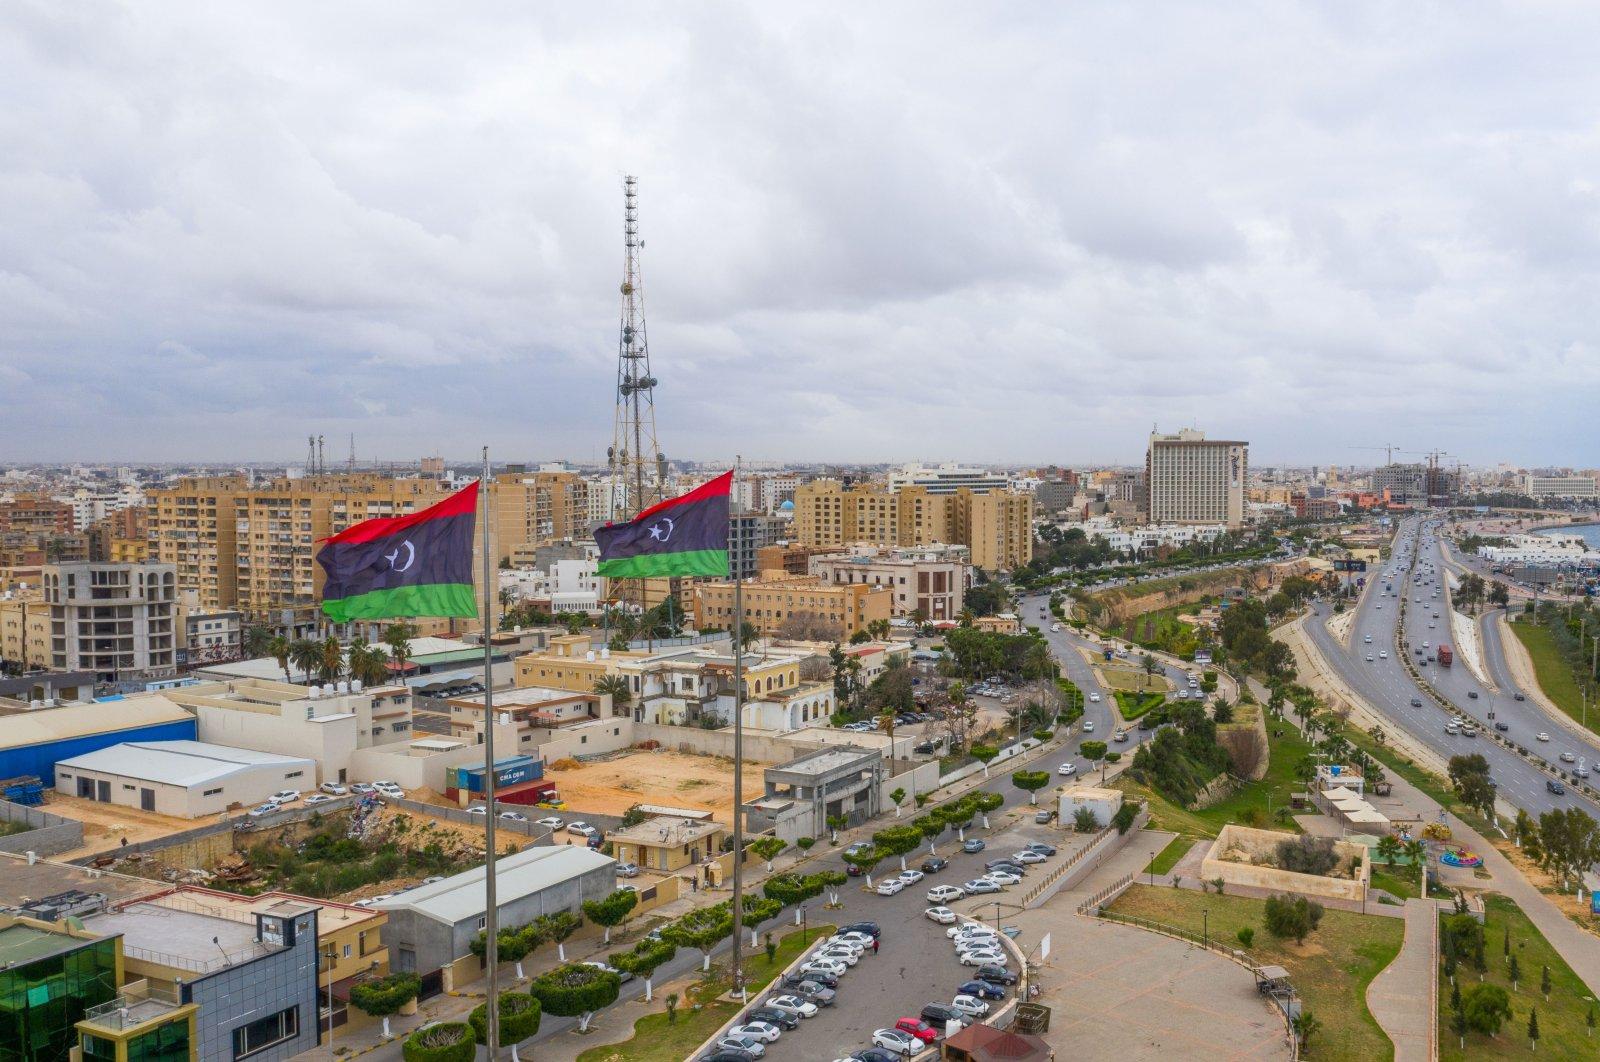 Capital of Libya, Tripoli seafront skyline view, Feb.14, 2021. (Shutterstock Photo)